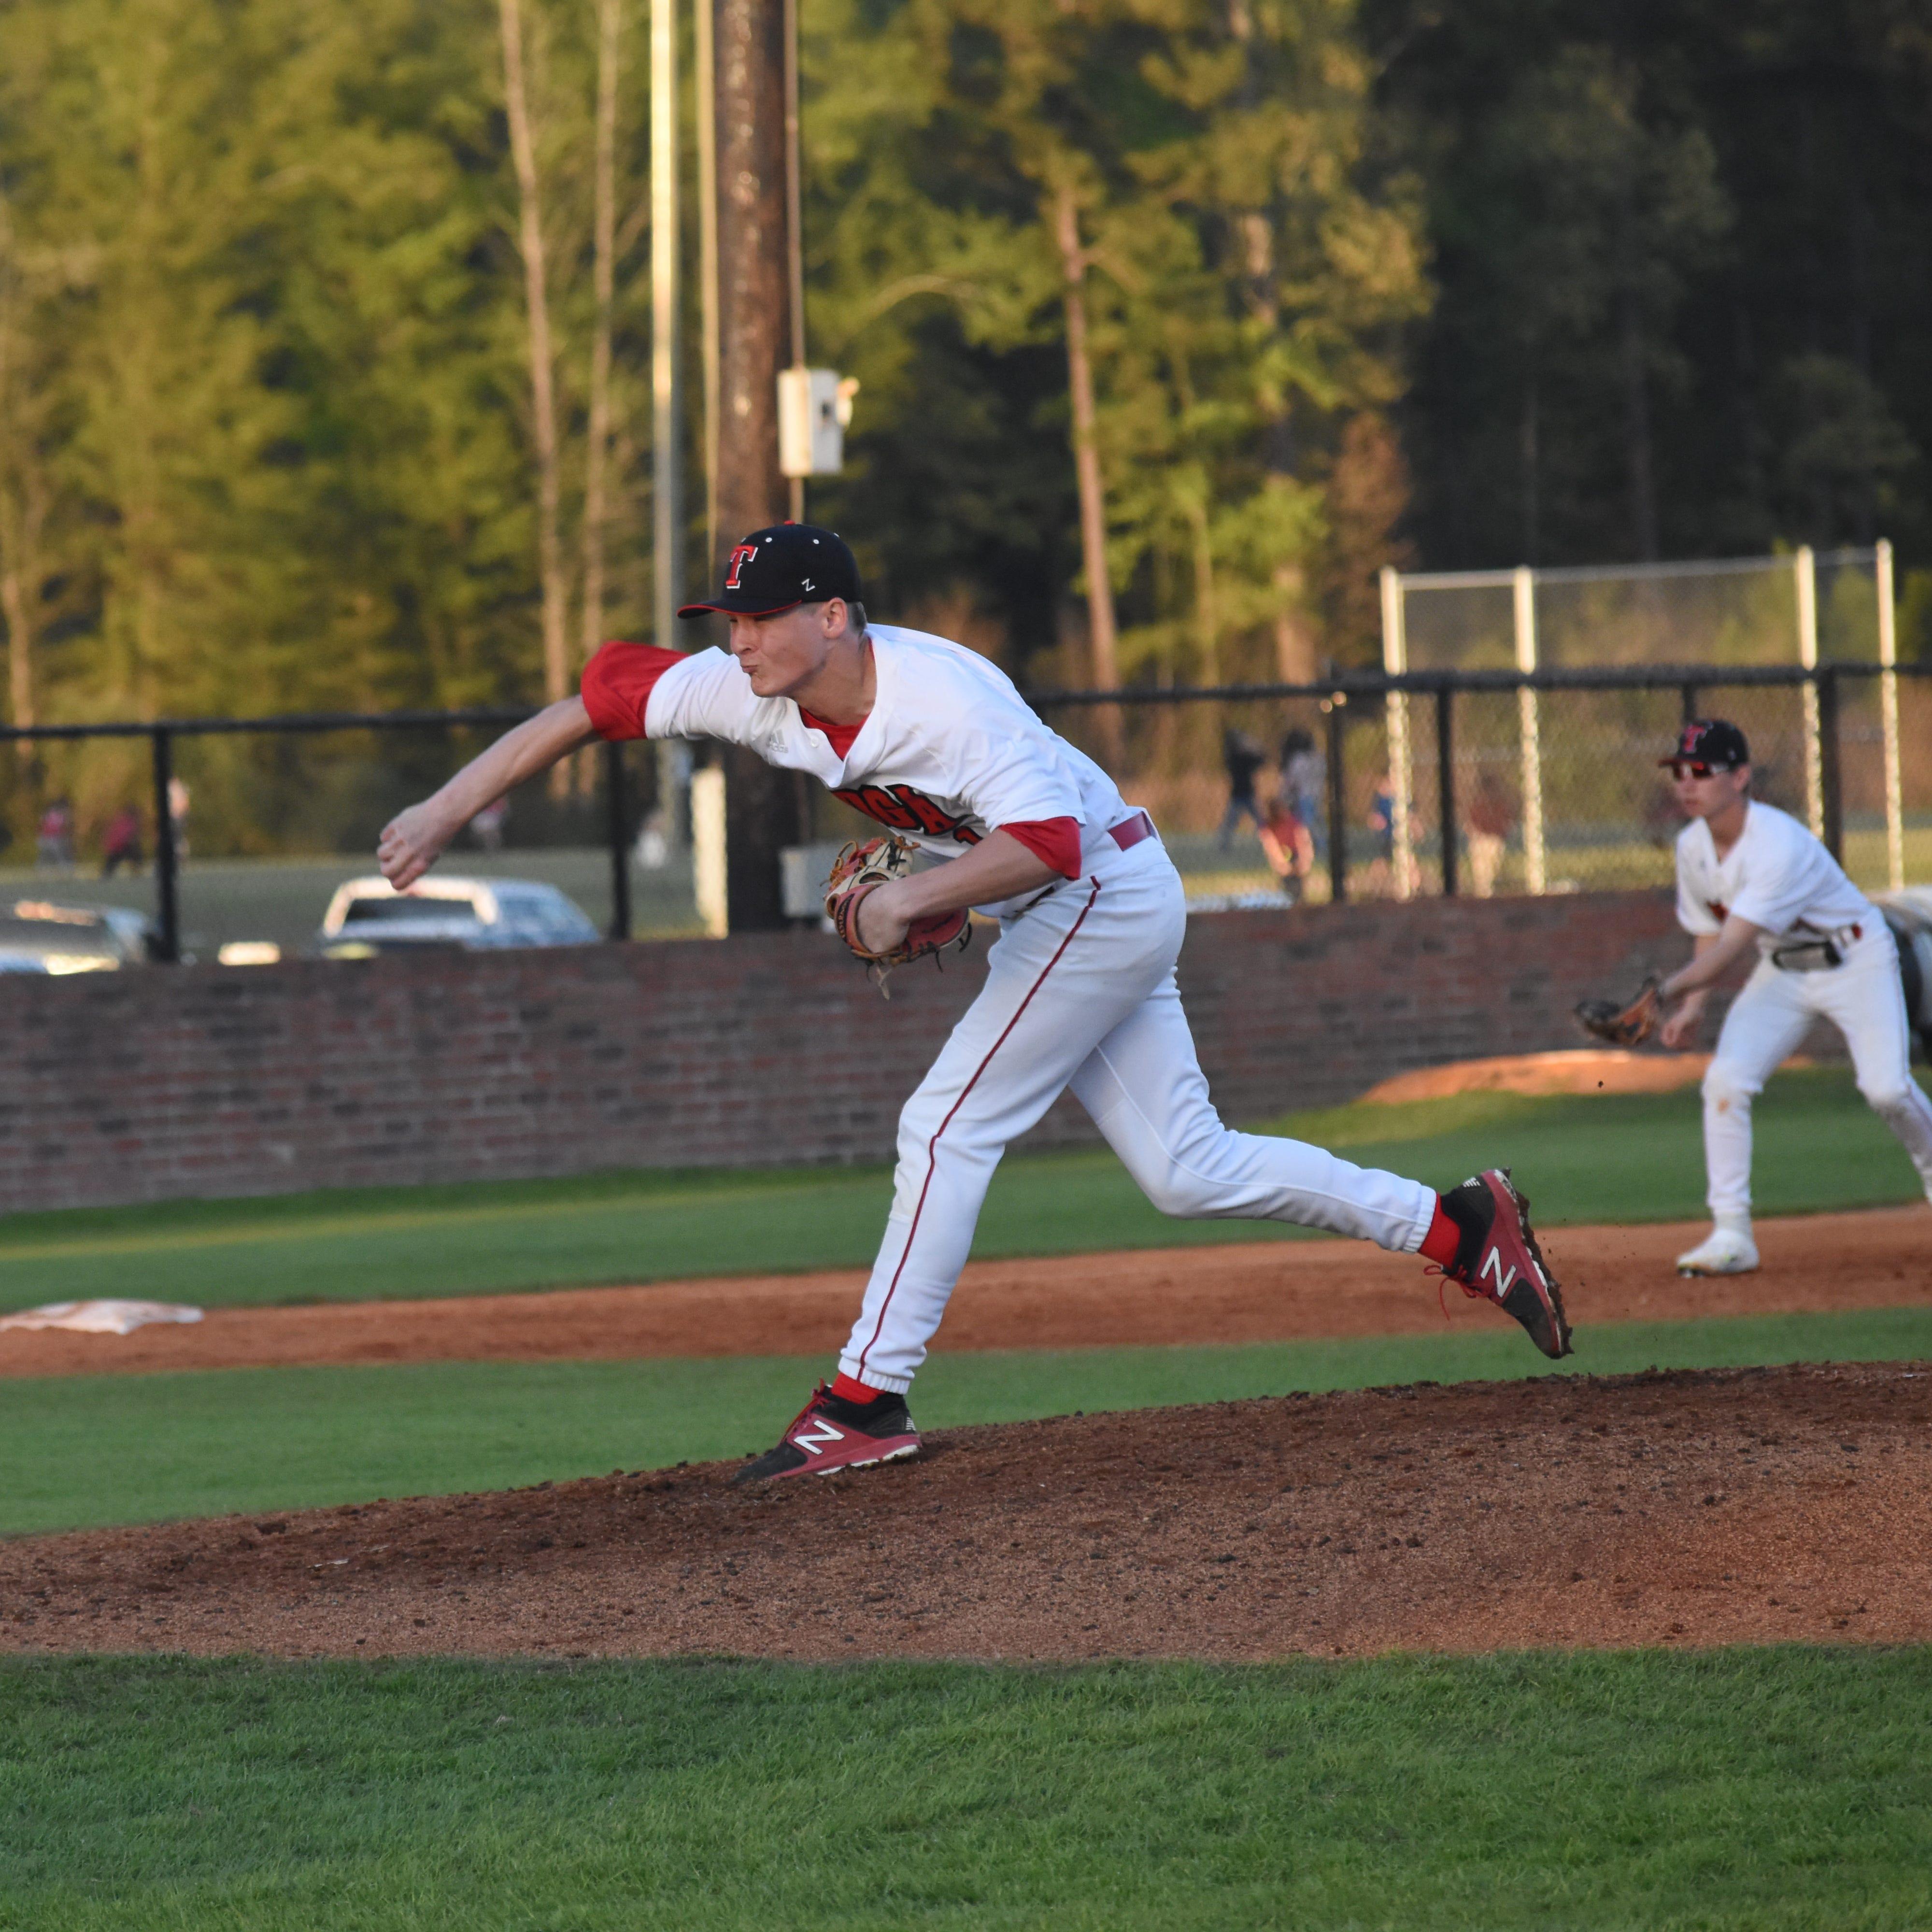 Tioga, Pitkin, Winnfield earn No. 1 seeds in LHSAA baseball playoffs